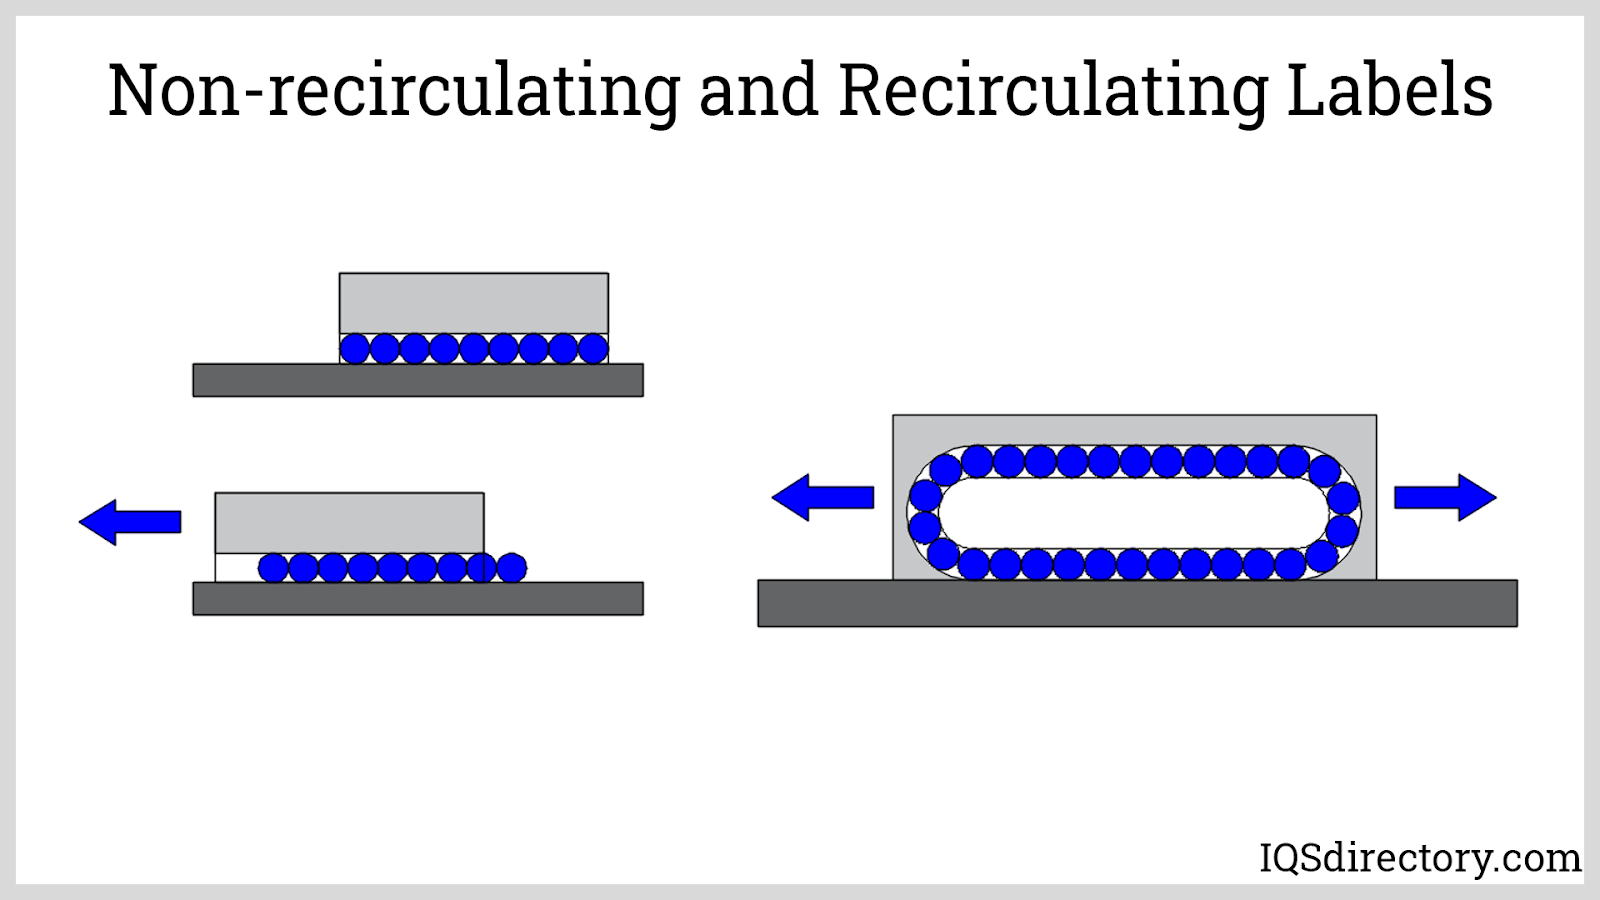 Non-recirculating and Recirculating Labels